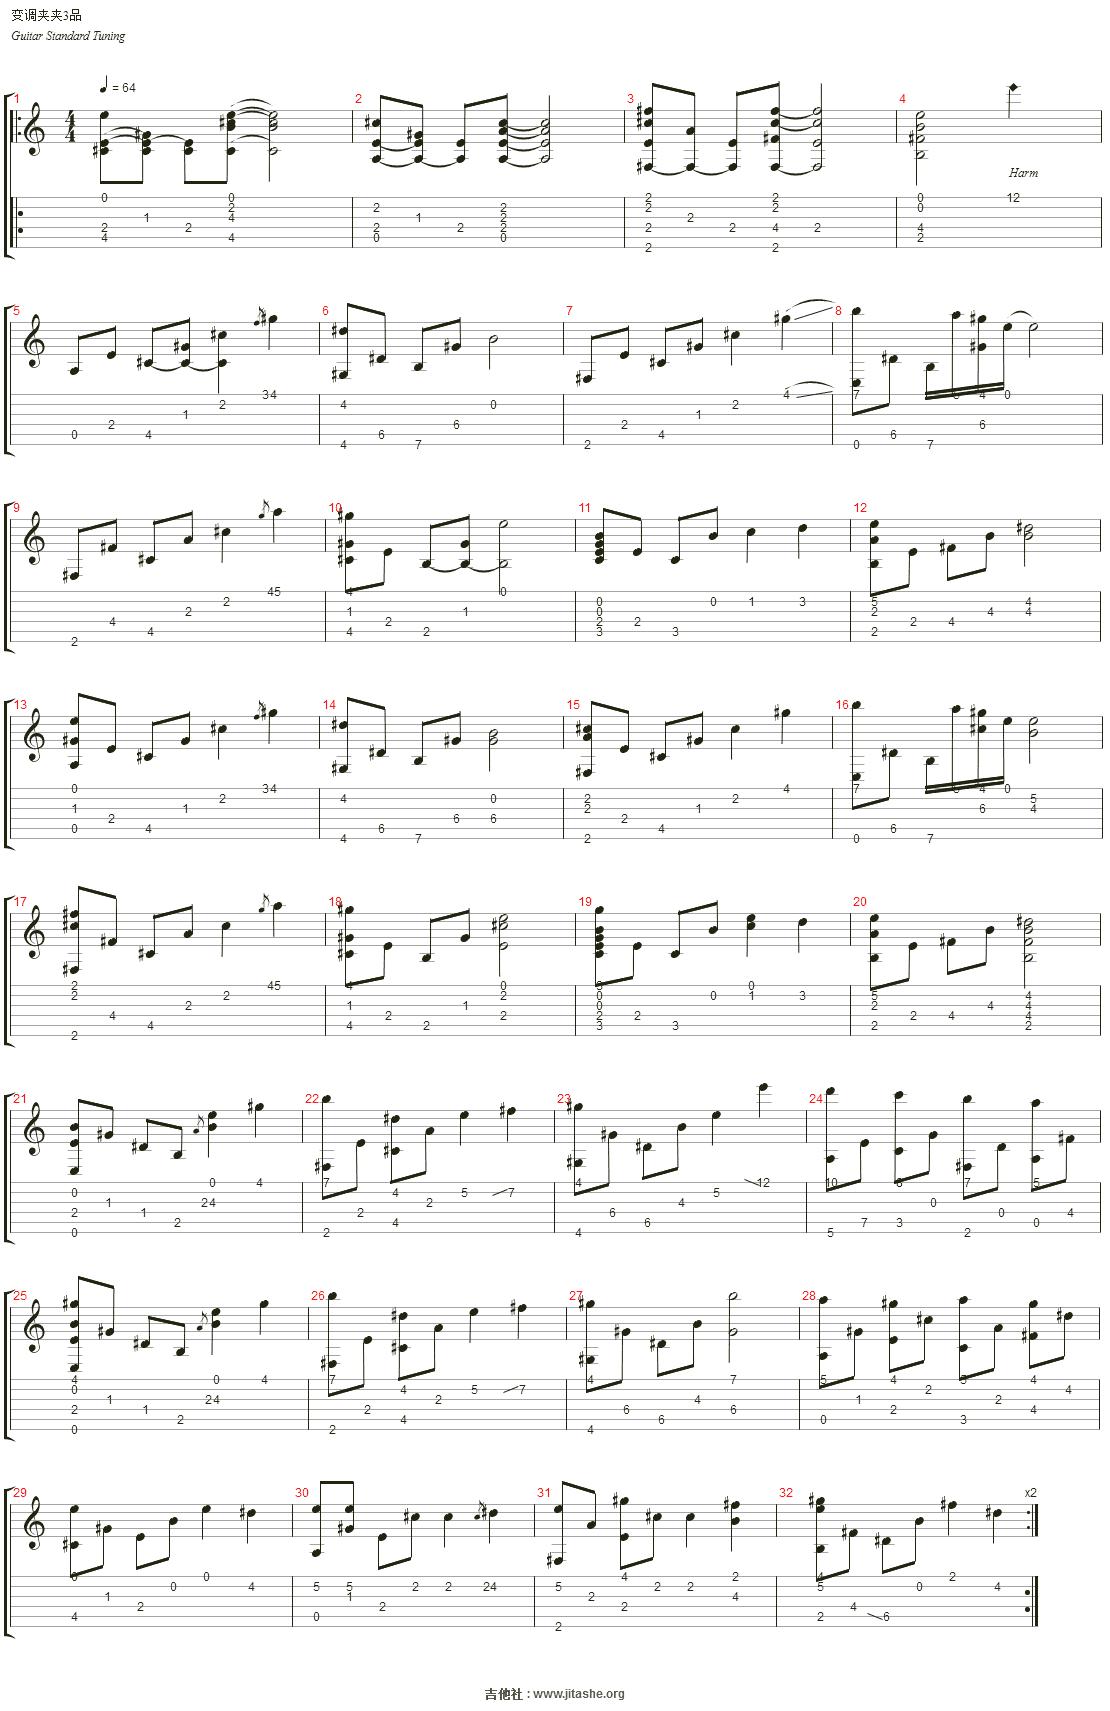 Nier(尼尔) - 穏ヤカナ眠リ(营地的bgm)吉他谱(Nylon Guitar)_动漫游戏